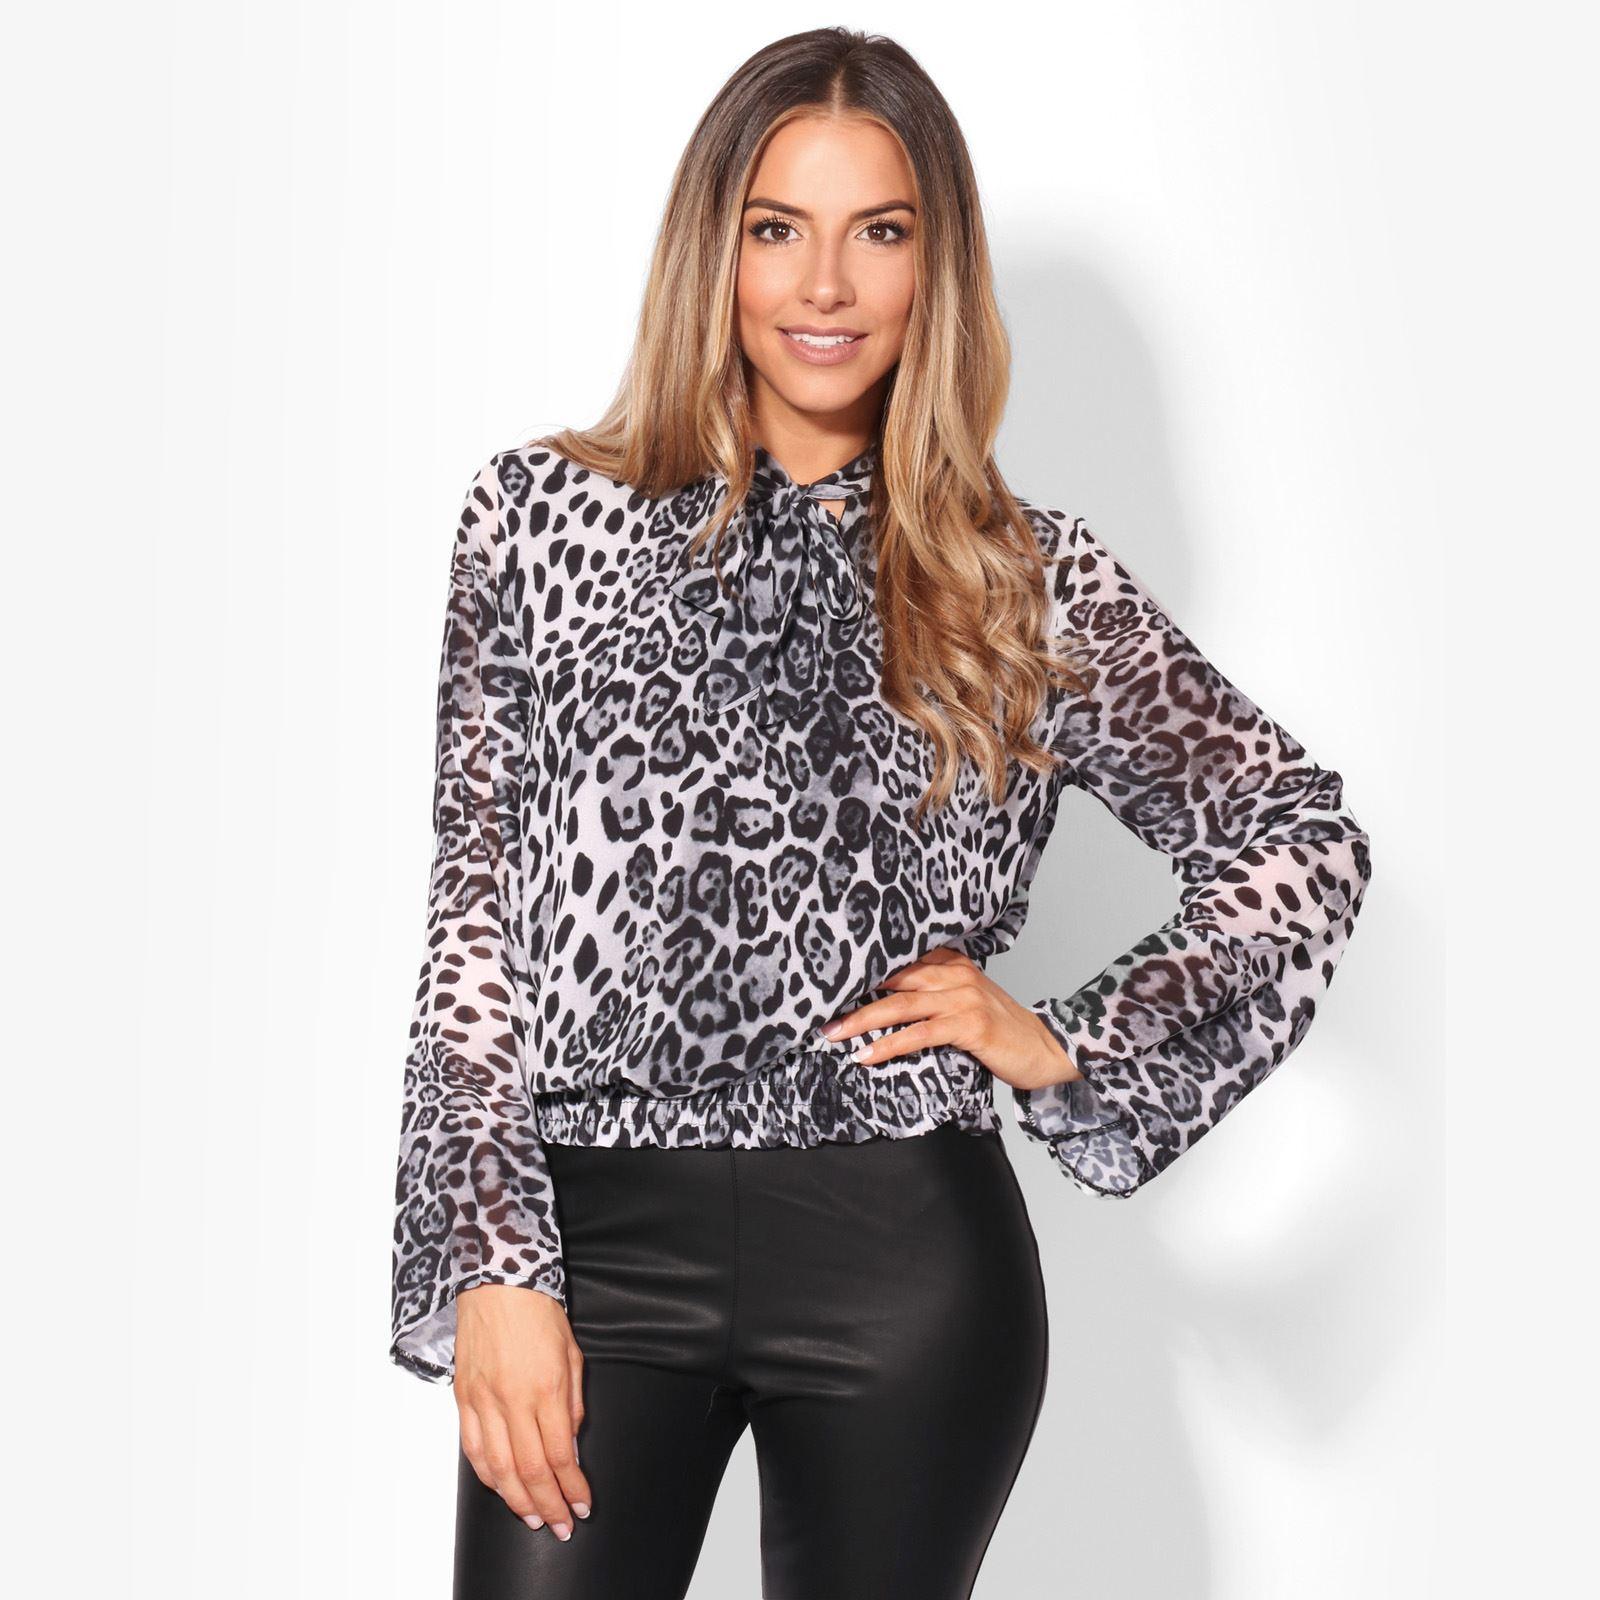 Women-Leopard-Chiffon-Tie-Pussy-Bow-Neck-Waist-Blouse-Top-Loose-Pleated-Shirt